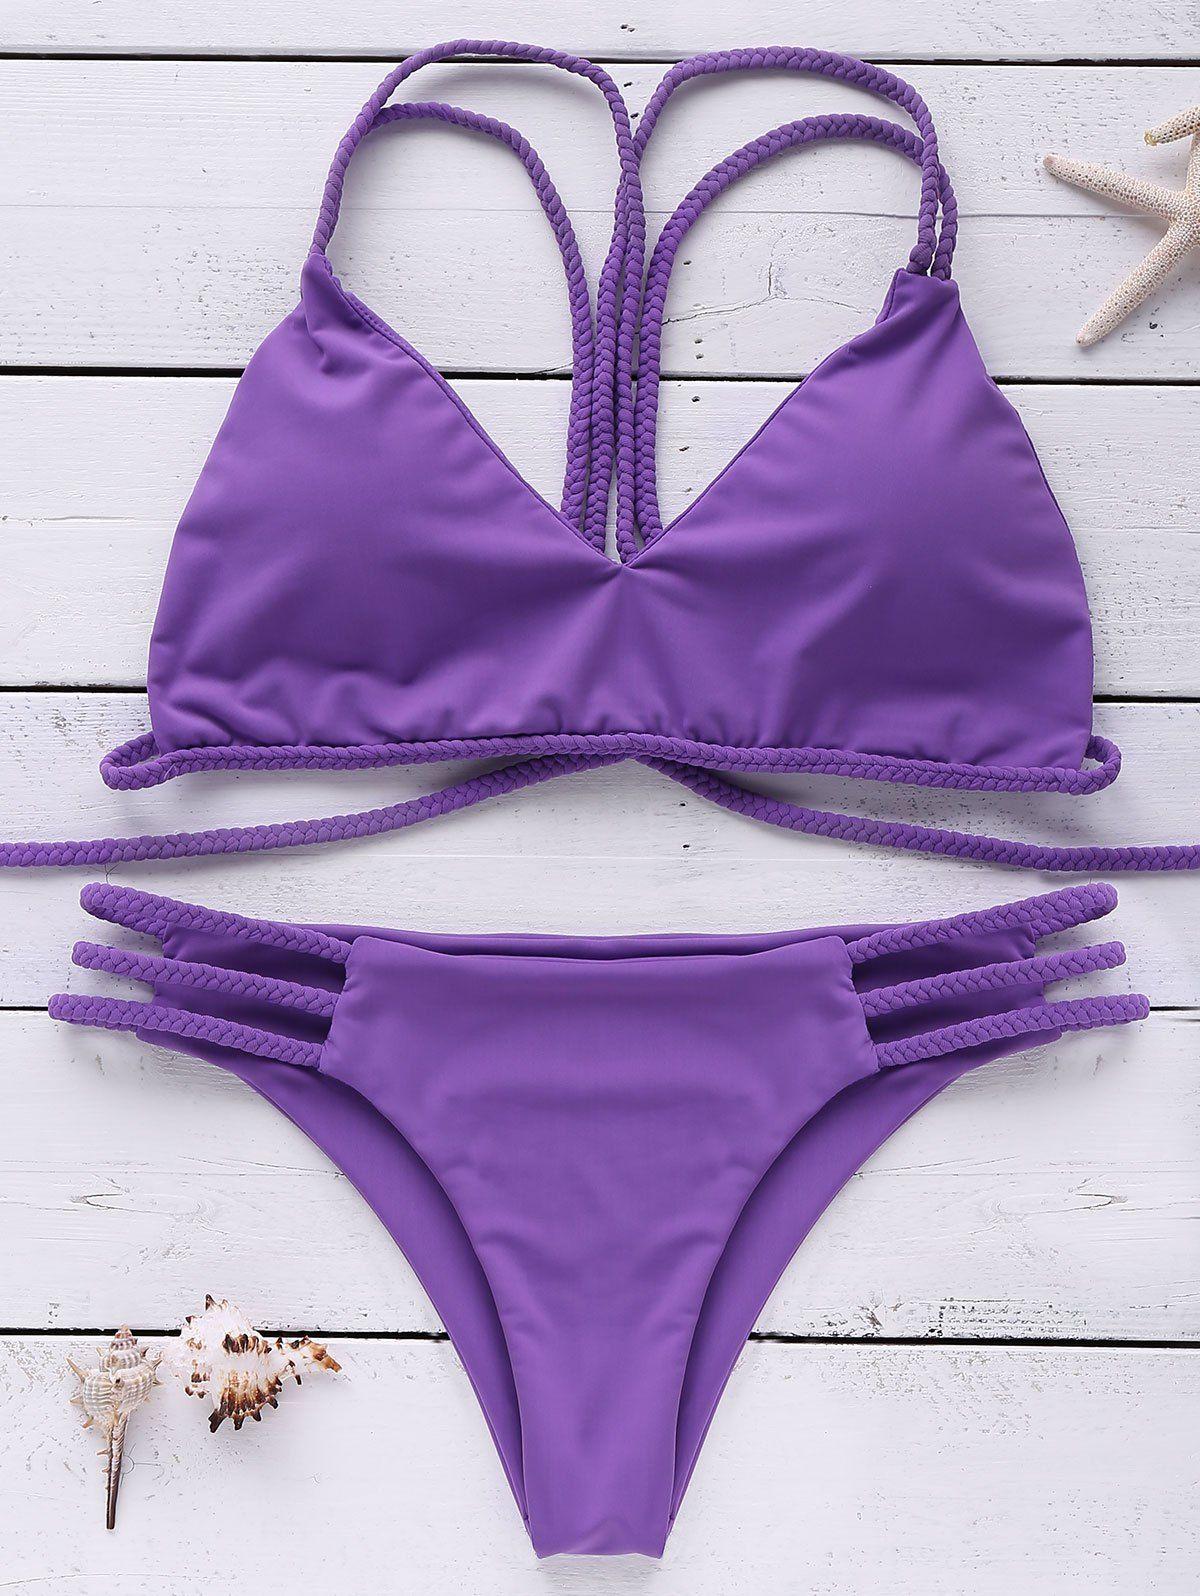 841416c89392f Stylish Strappy Braided Cut Out Bikini Set For Women in 2019 ...